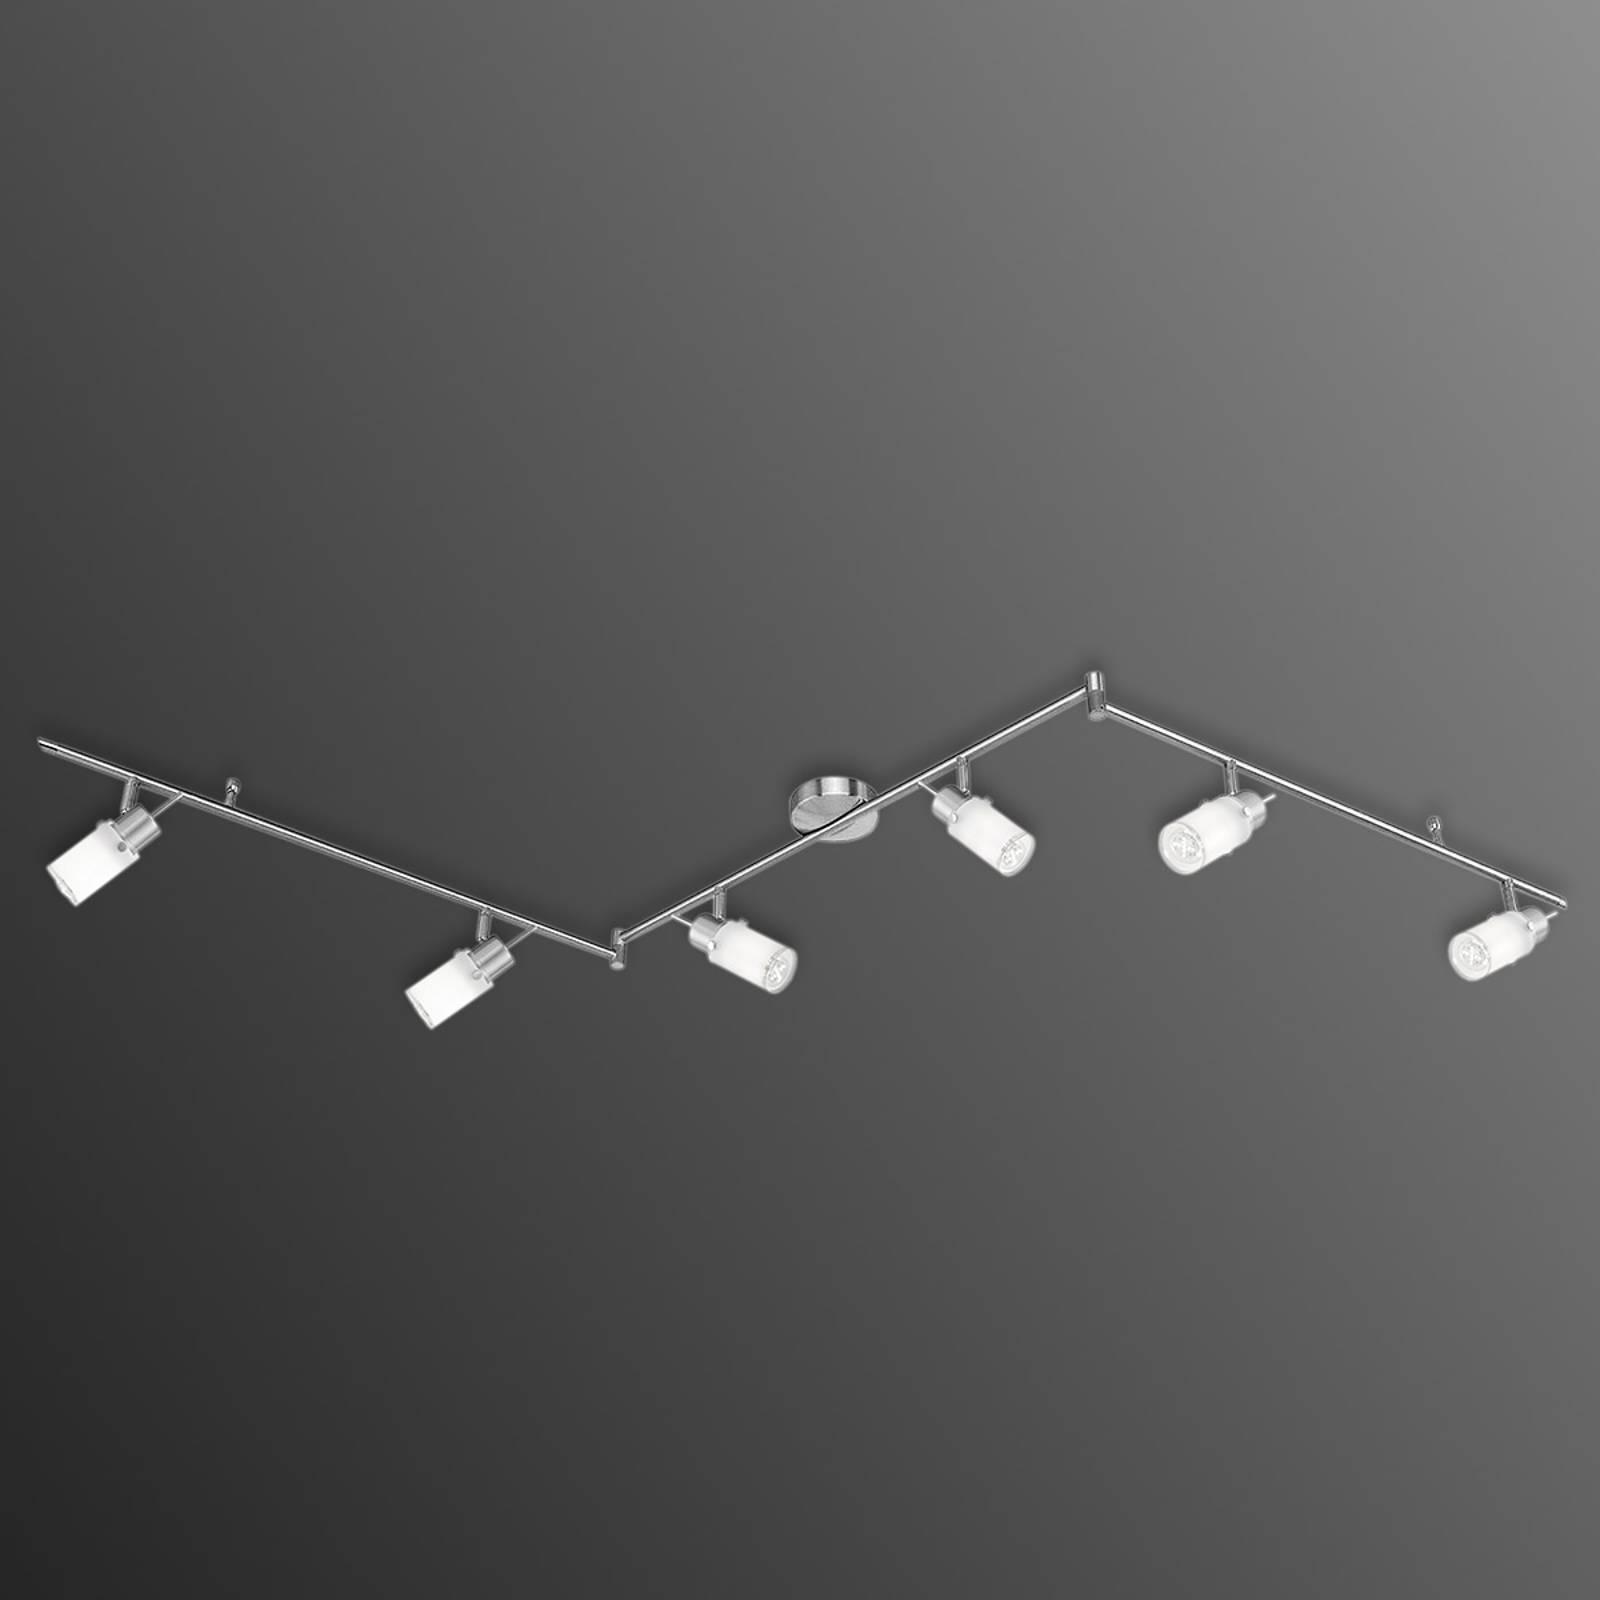 Driearmige LED plafondlamp Max met 6 lampen